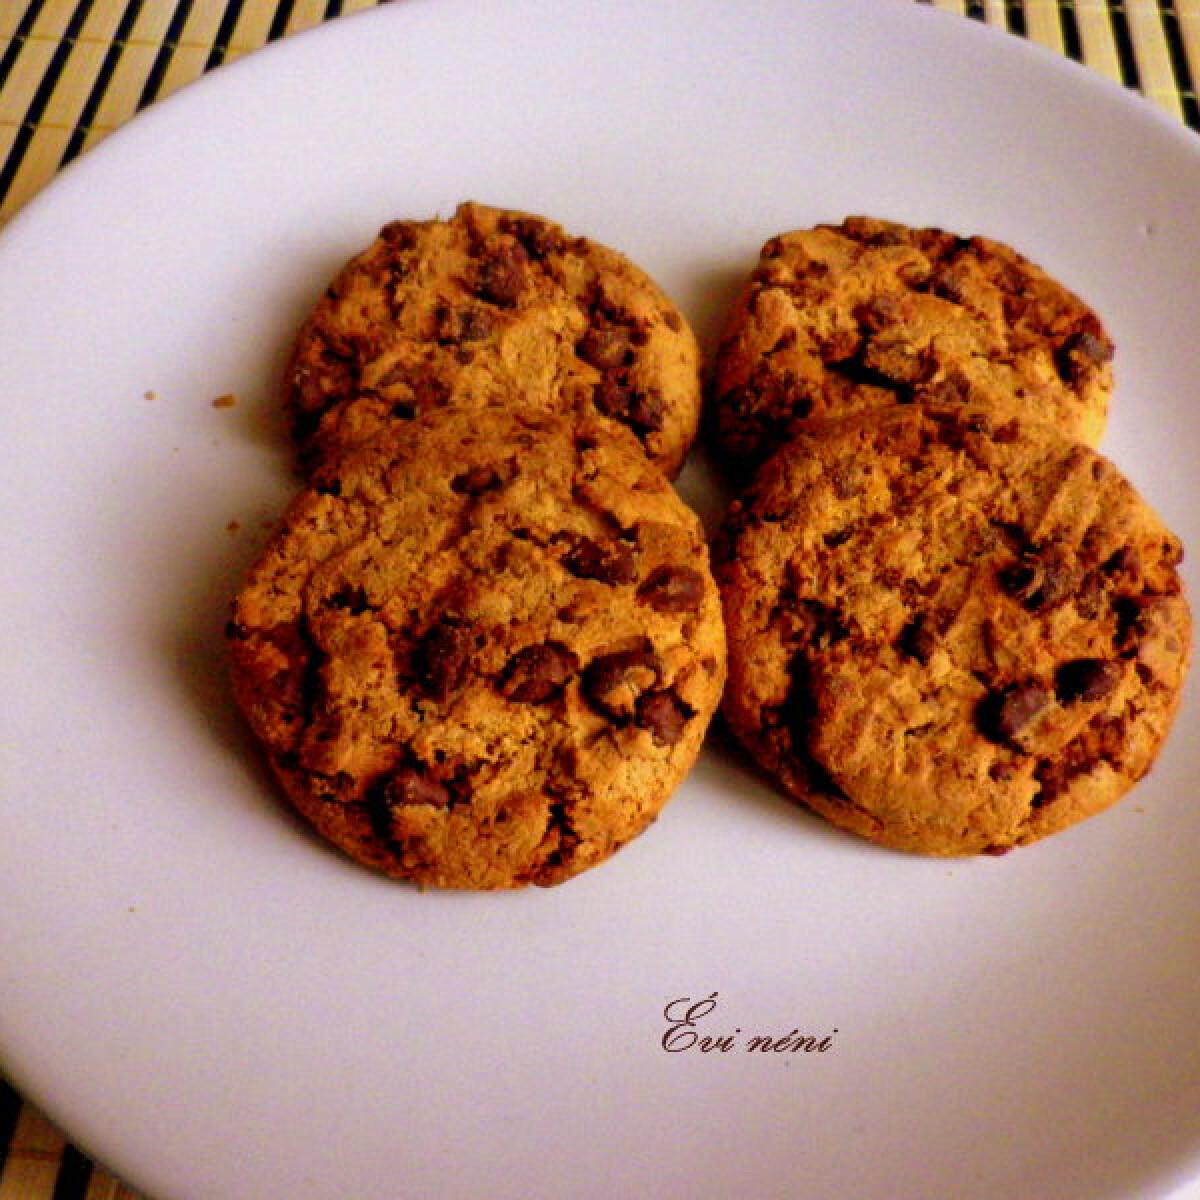 Kanadai keksz